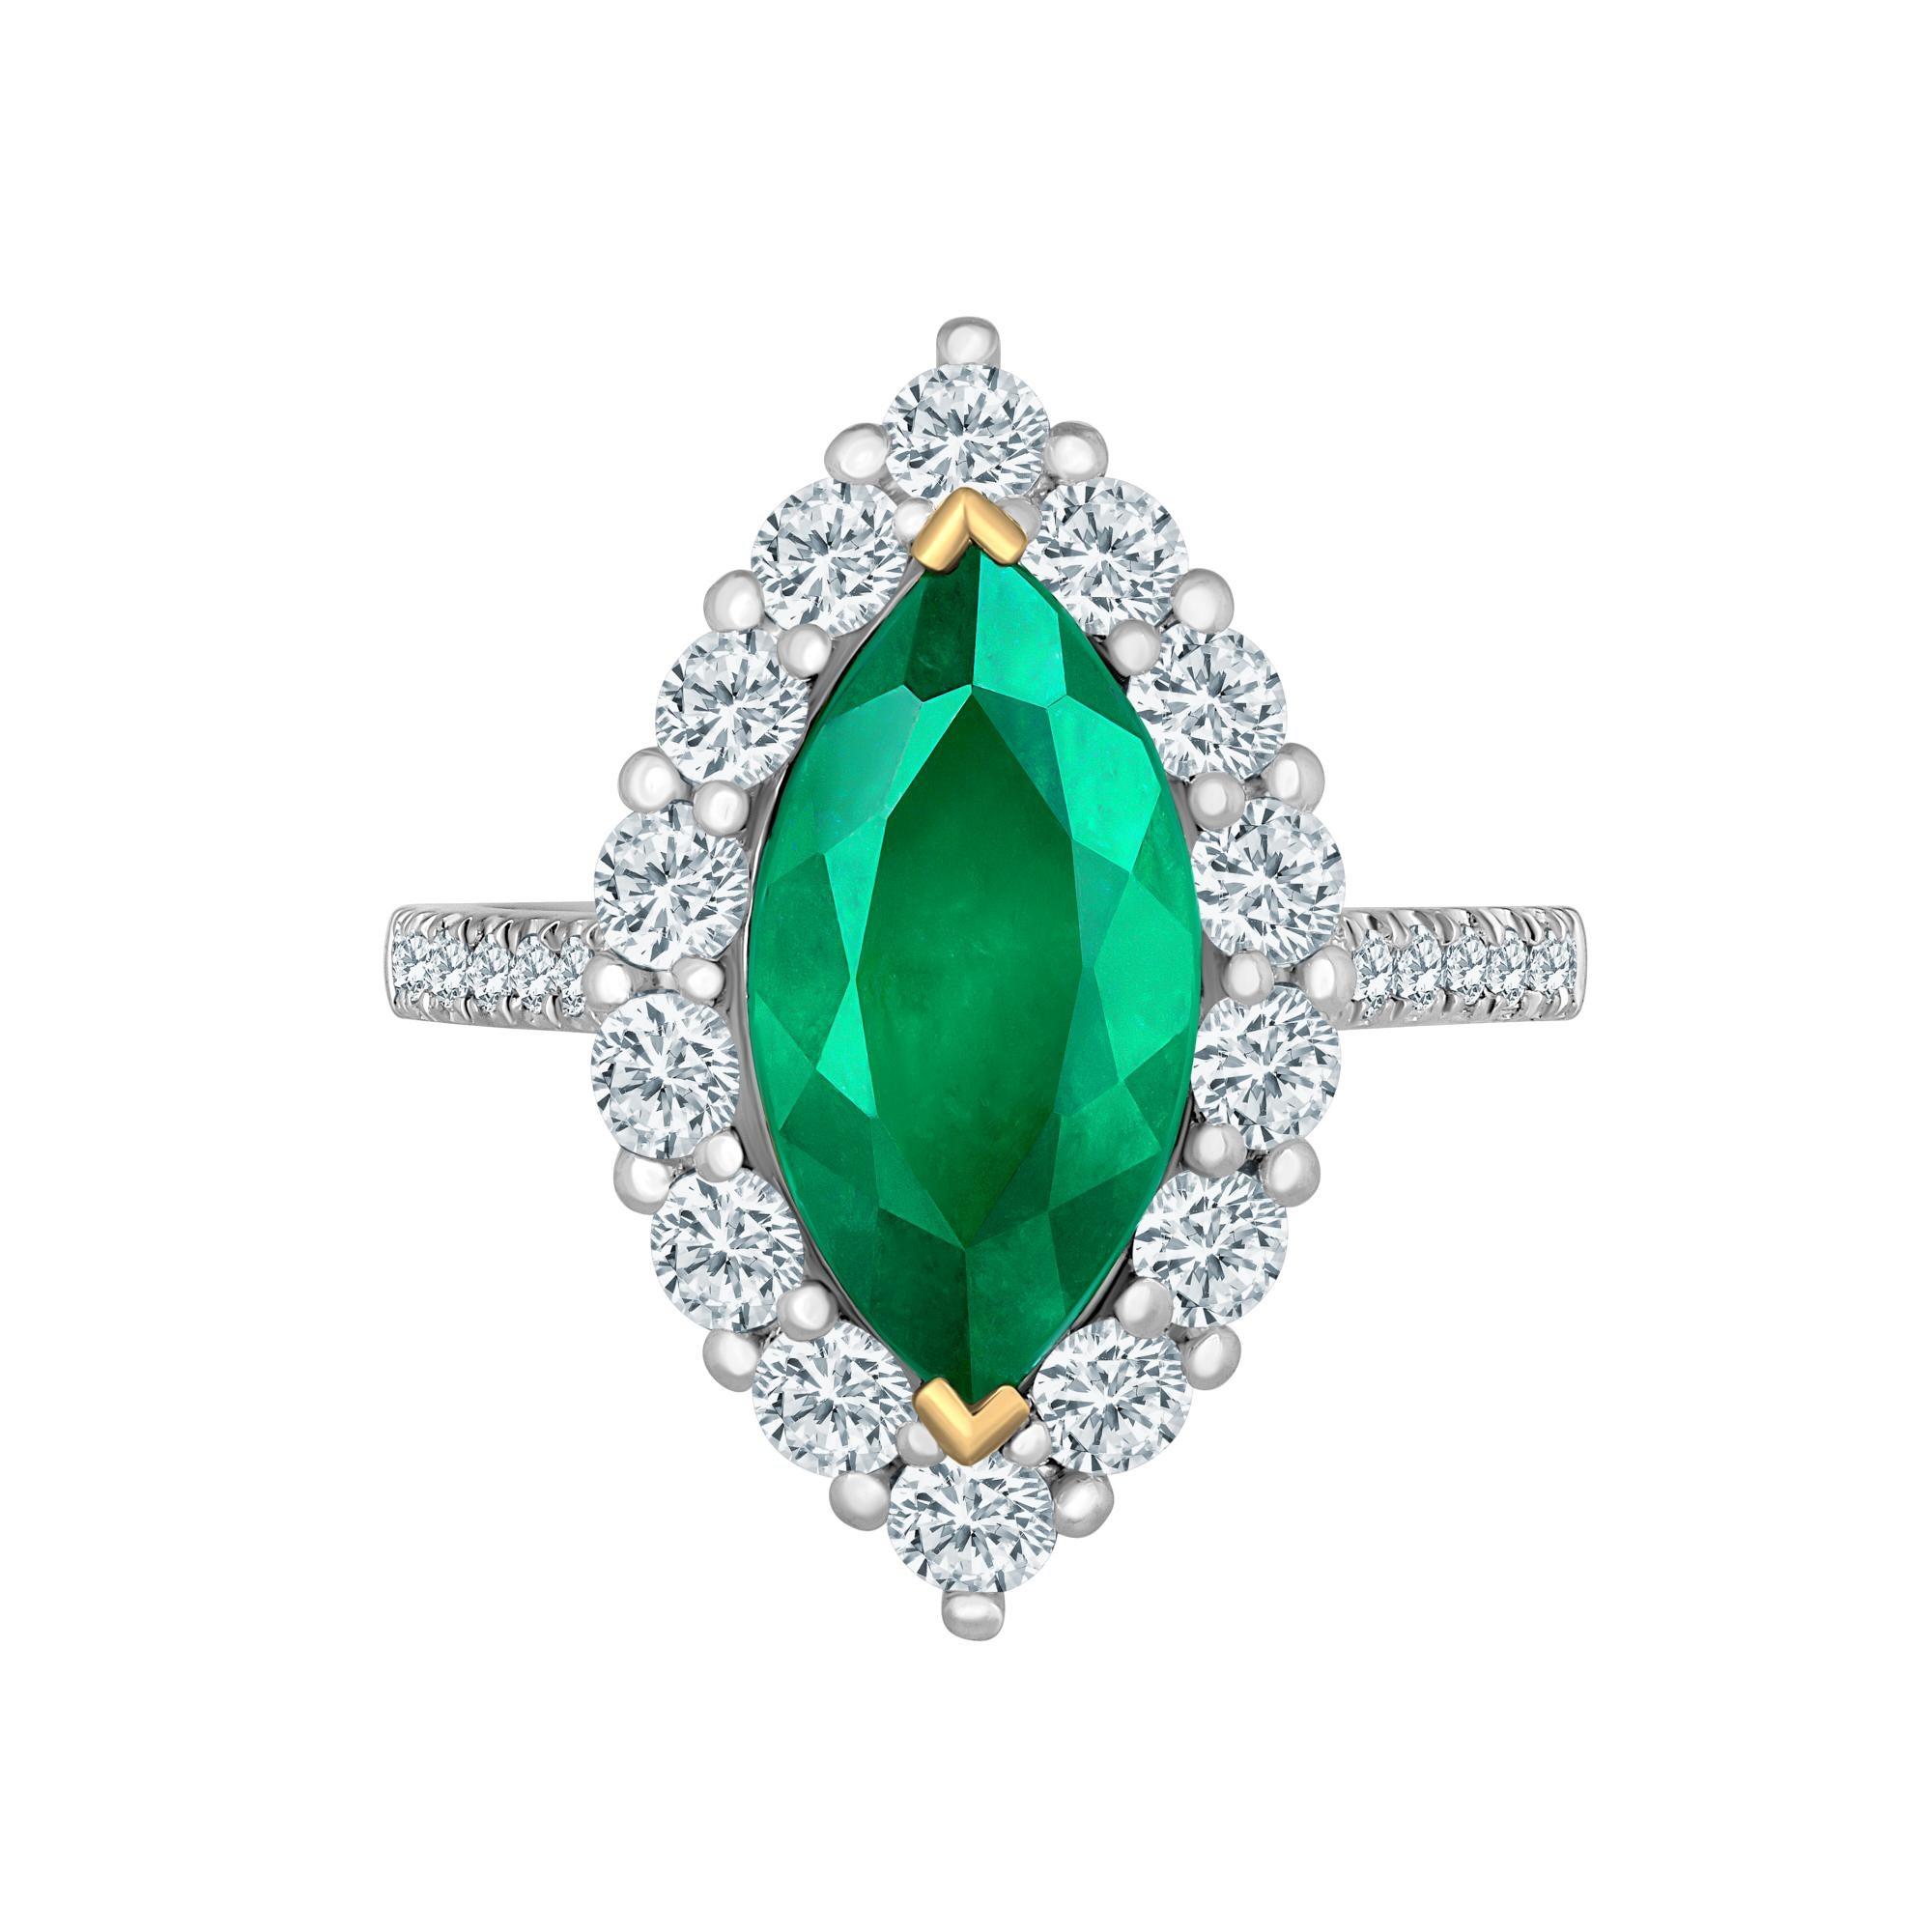 Emilio Jewelry Marquise Colombian Emerald Diamond Ring